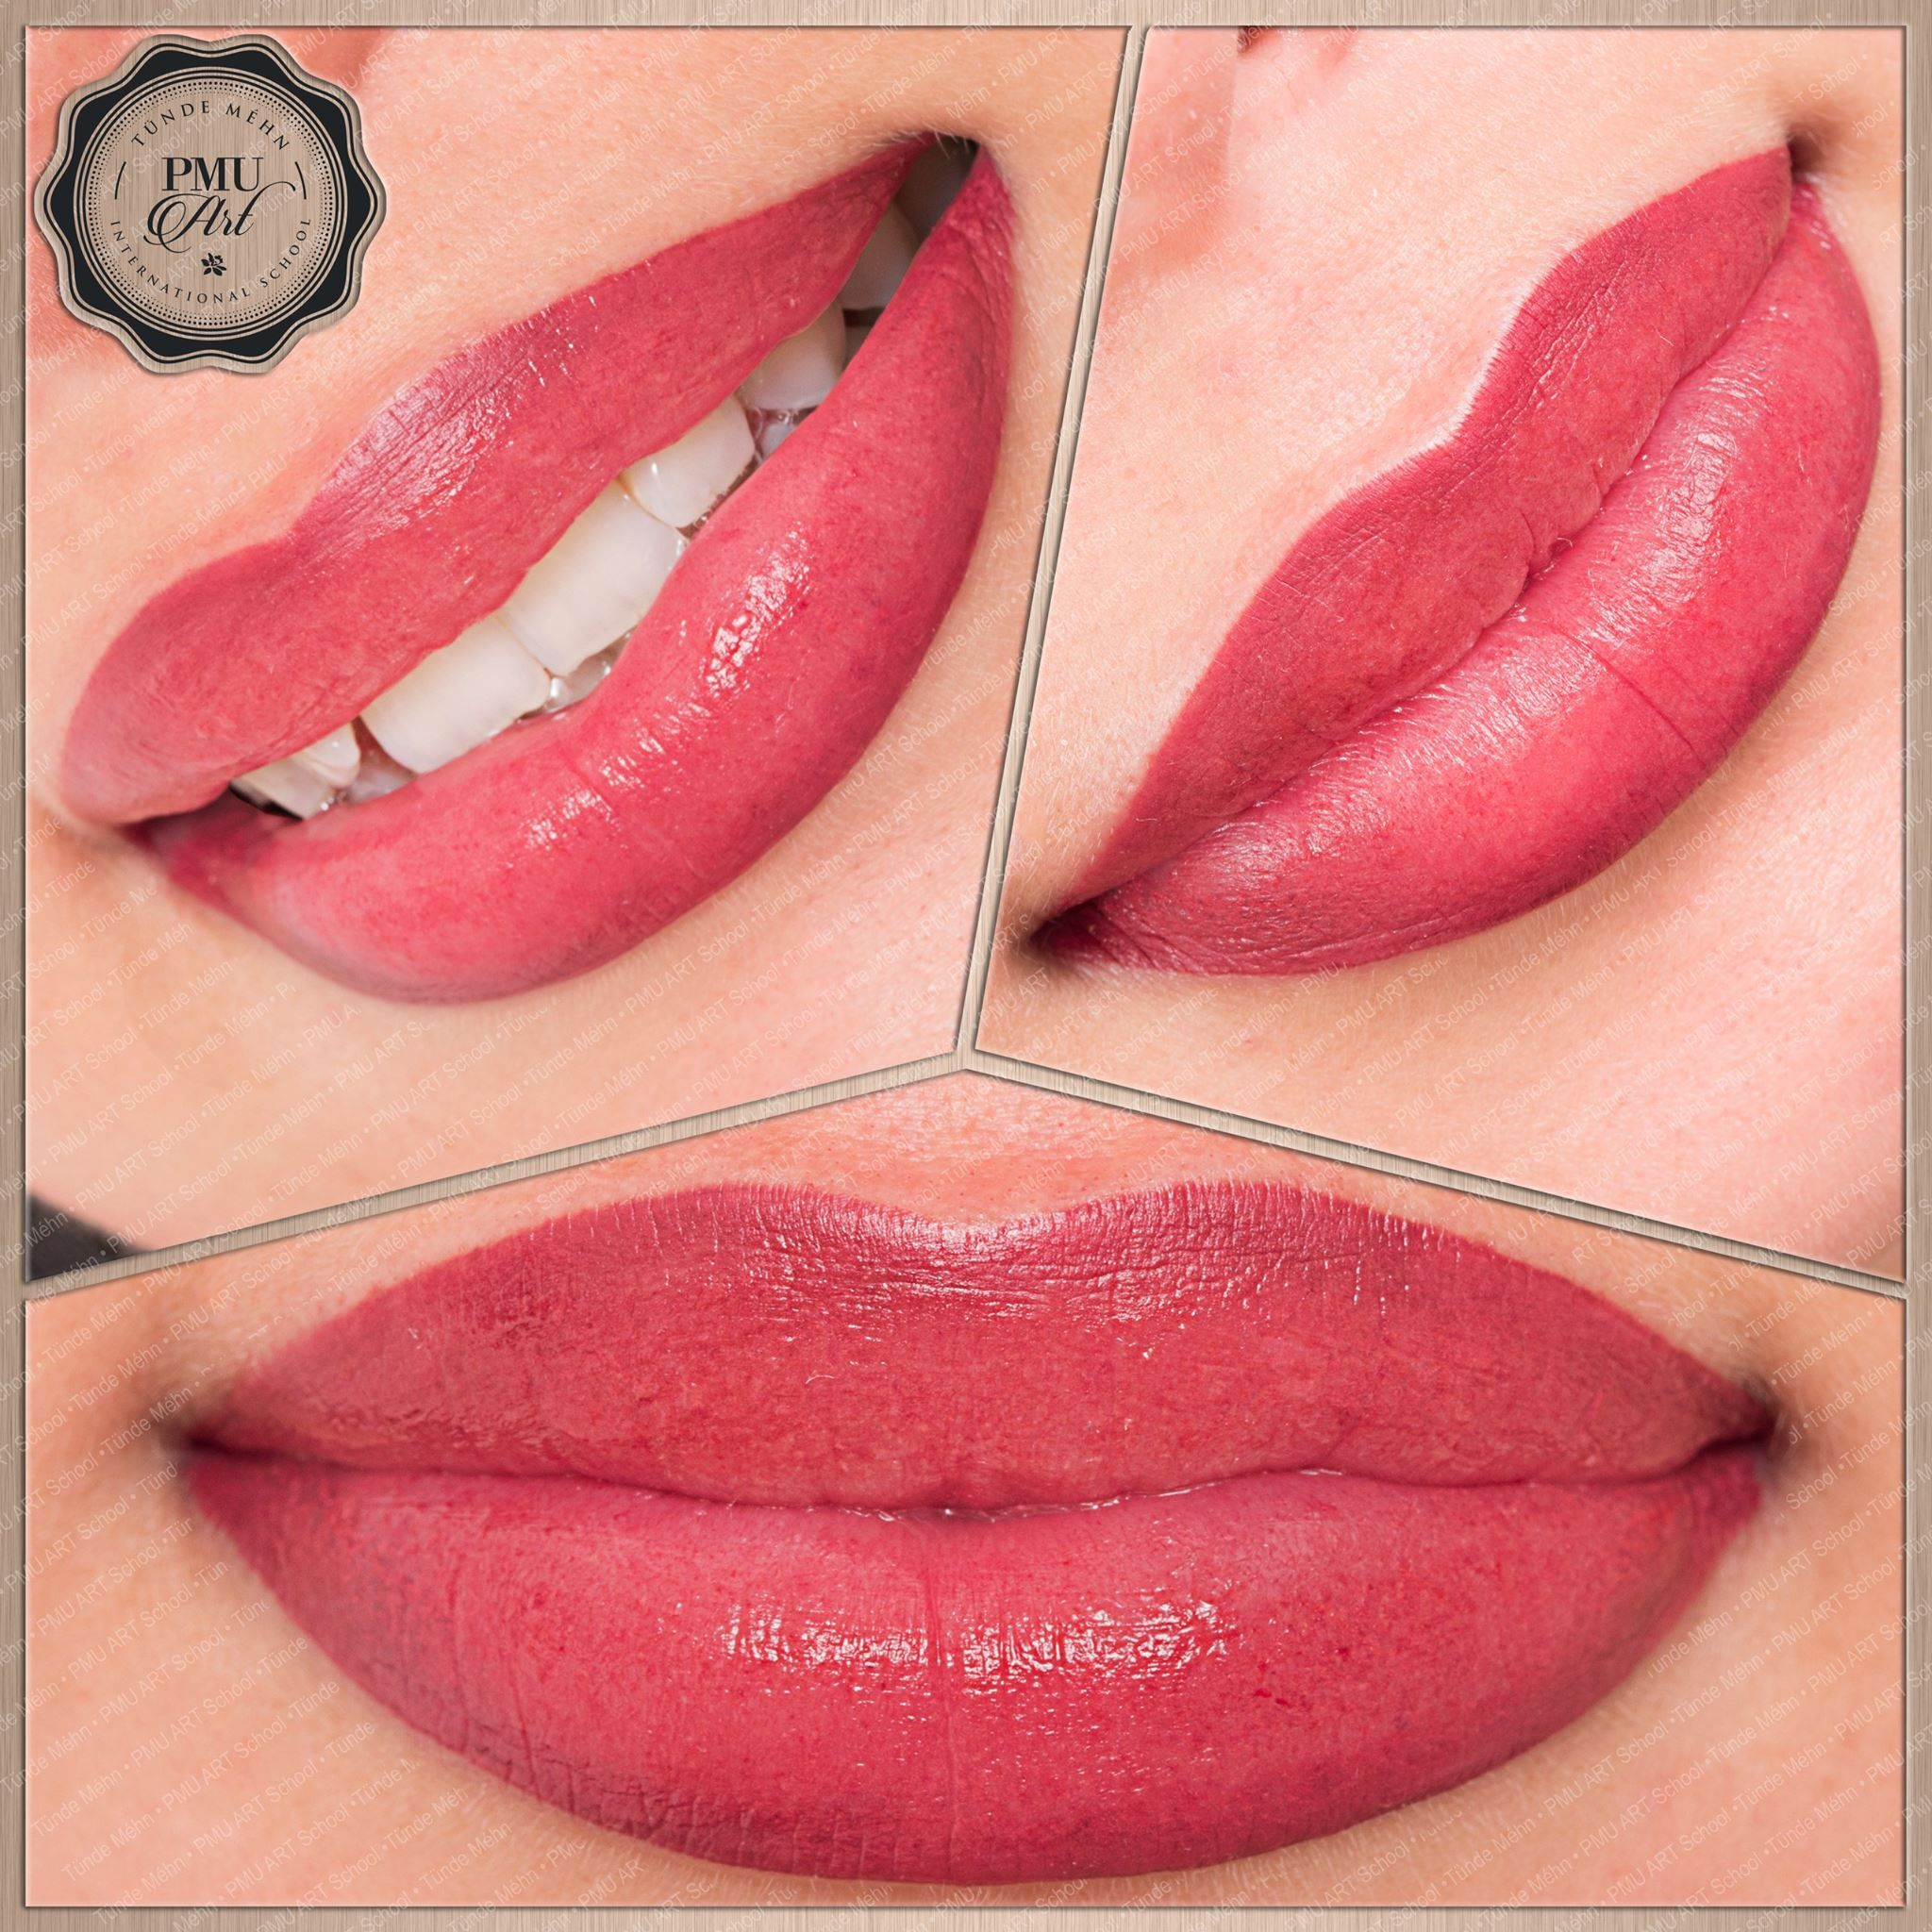 Pmu Full Shade Lip Tattoo Makeup Lip Color Tattoo Permanent